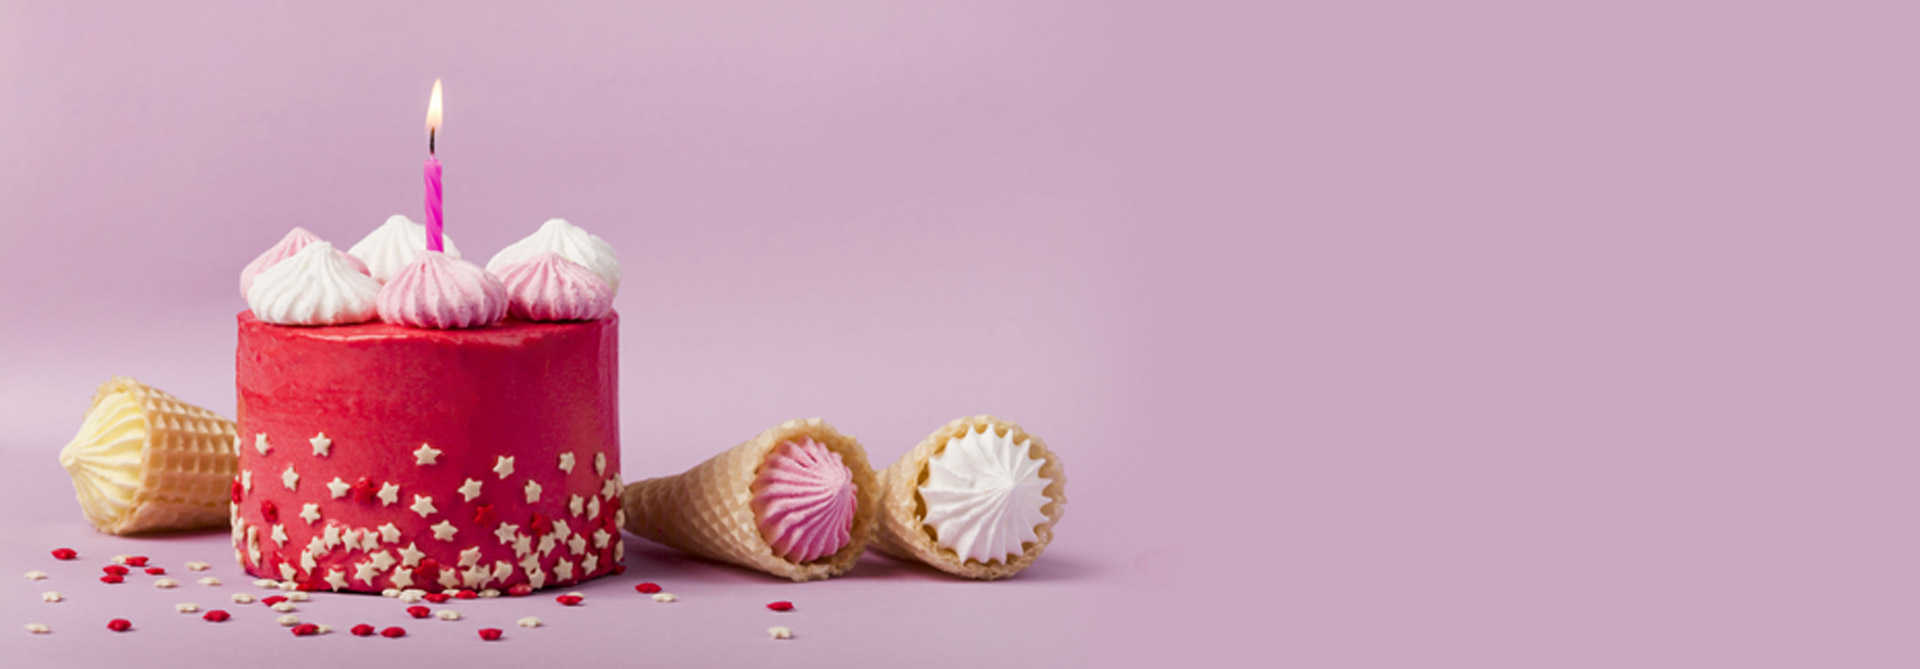 Send Cake to rasht | Order Cake in rasht | Florists inexpensively | rasht Florist | rasht Cake